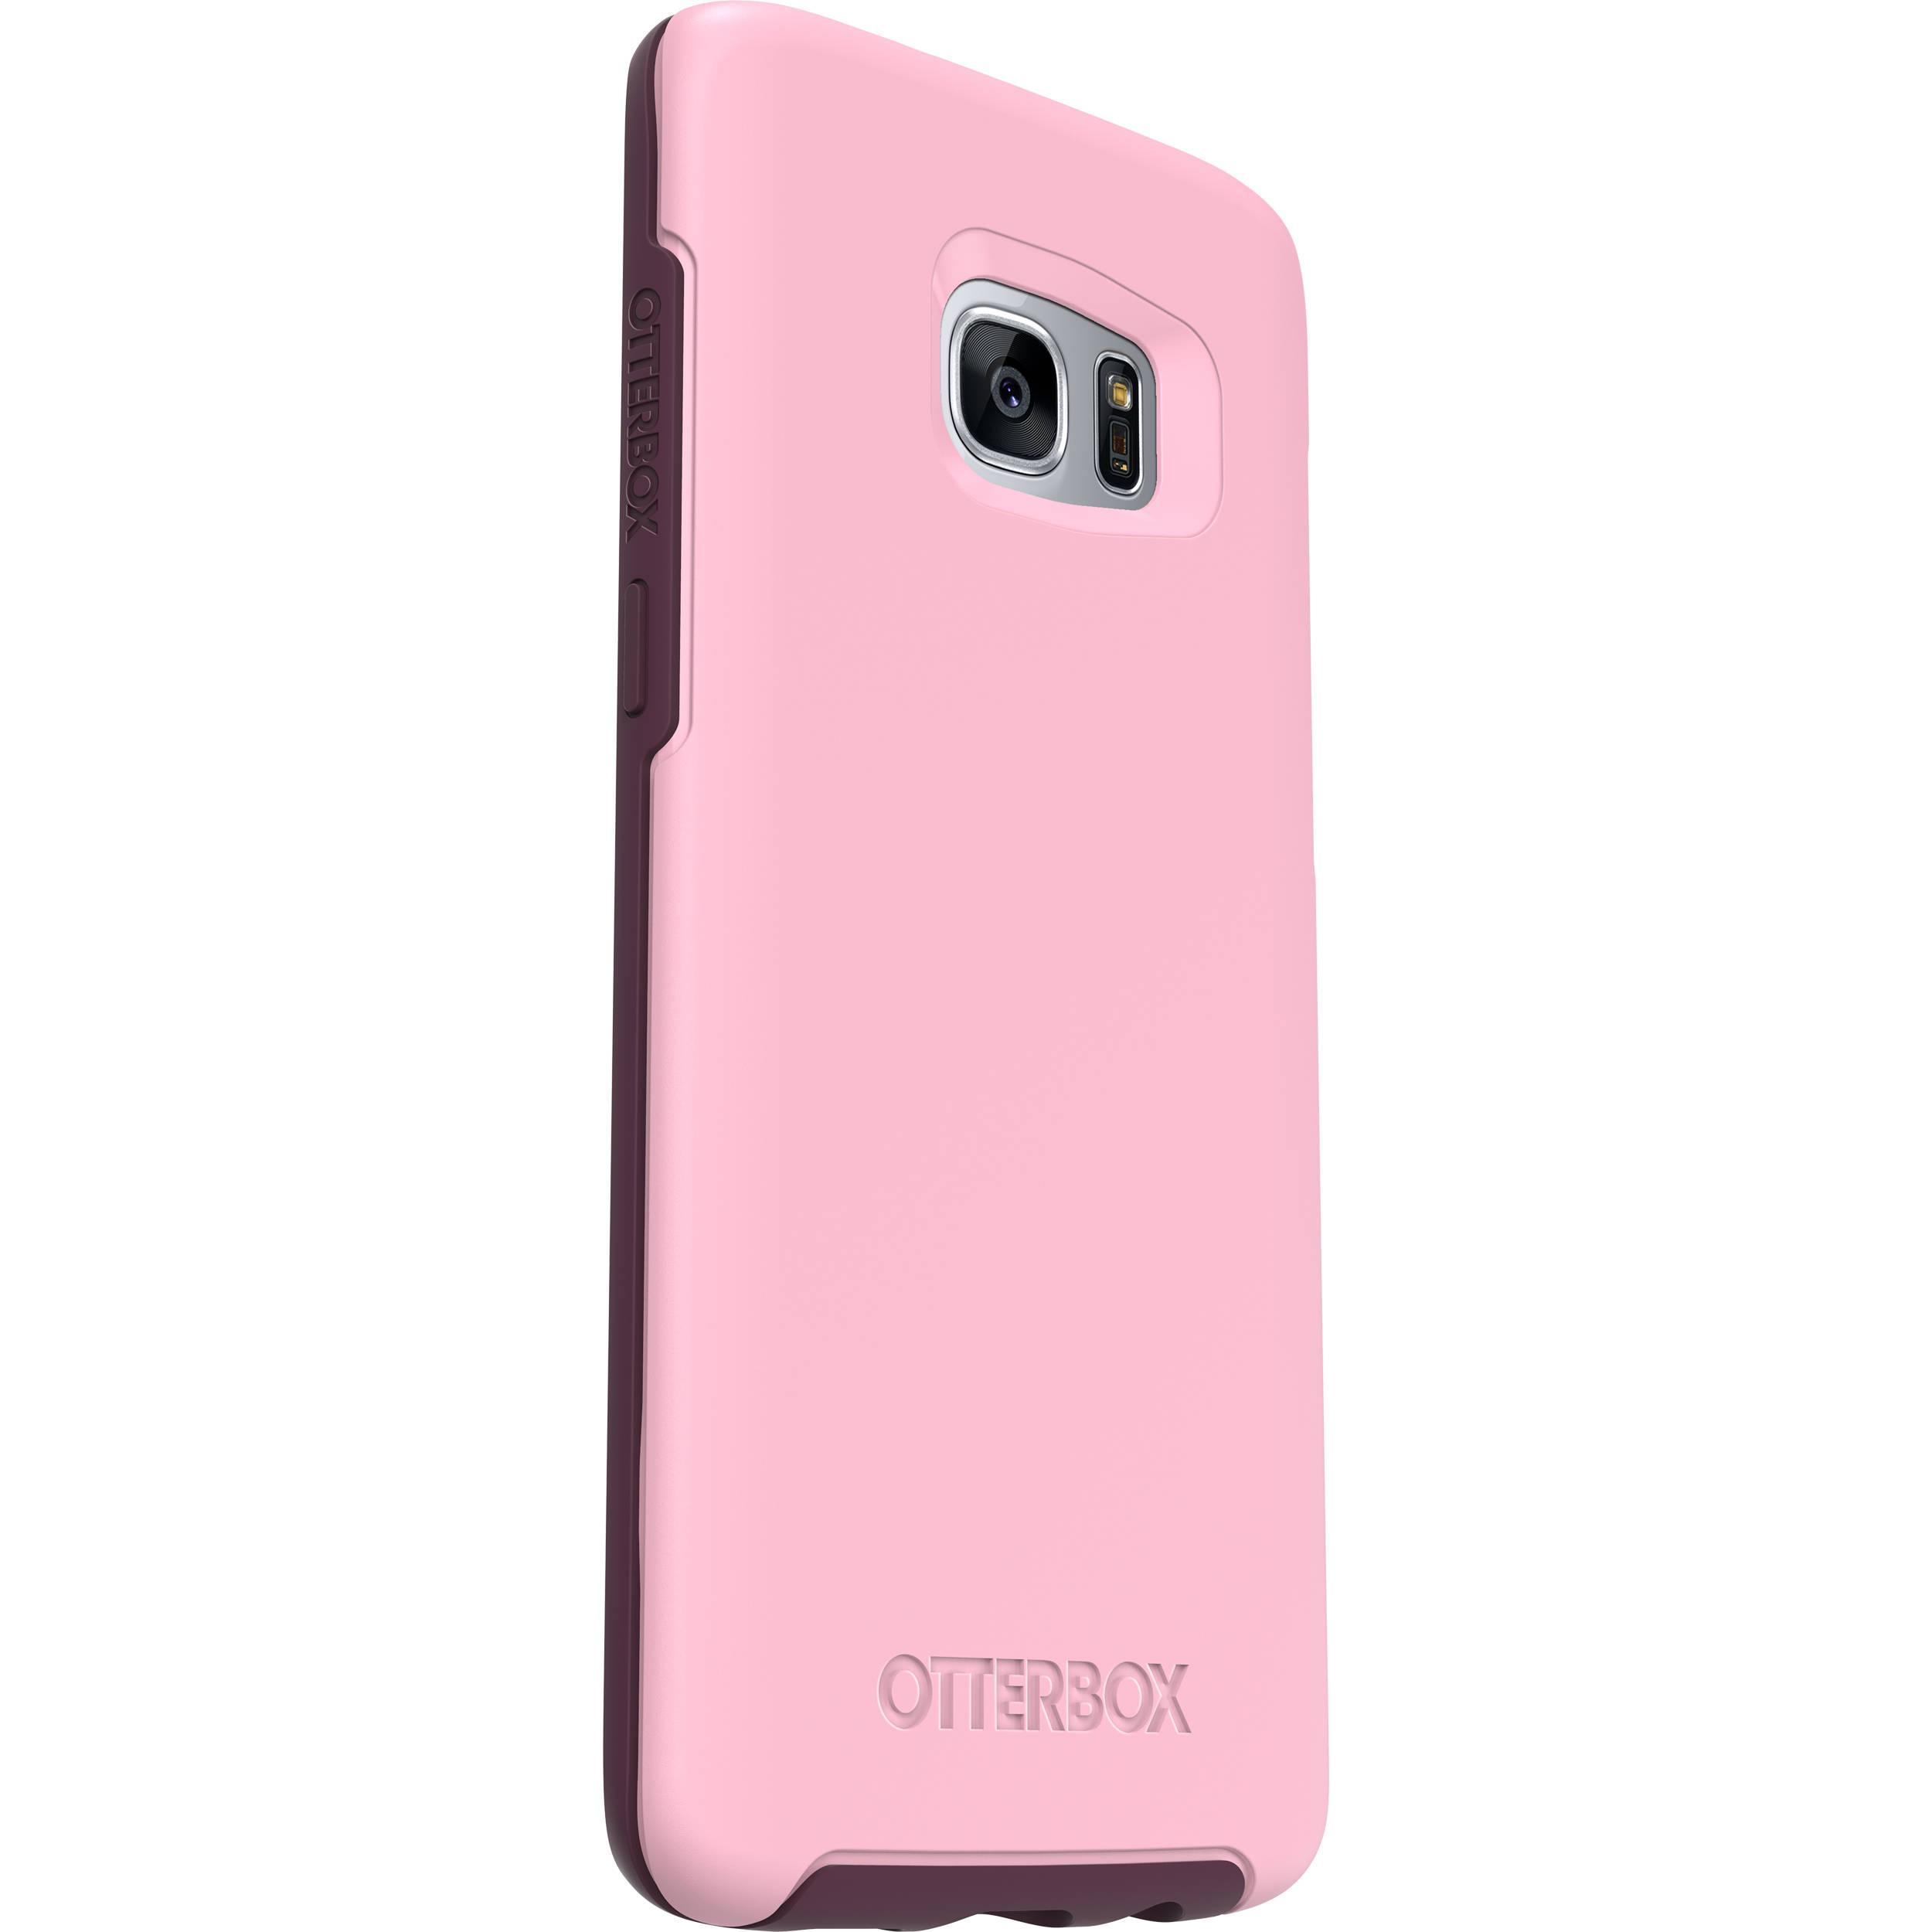 sports shoes b9855 bd1ac OtterBox Symmetry Series Case for Galaxy S7 edge (Rose (Light Pink/Dark  Purple))